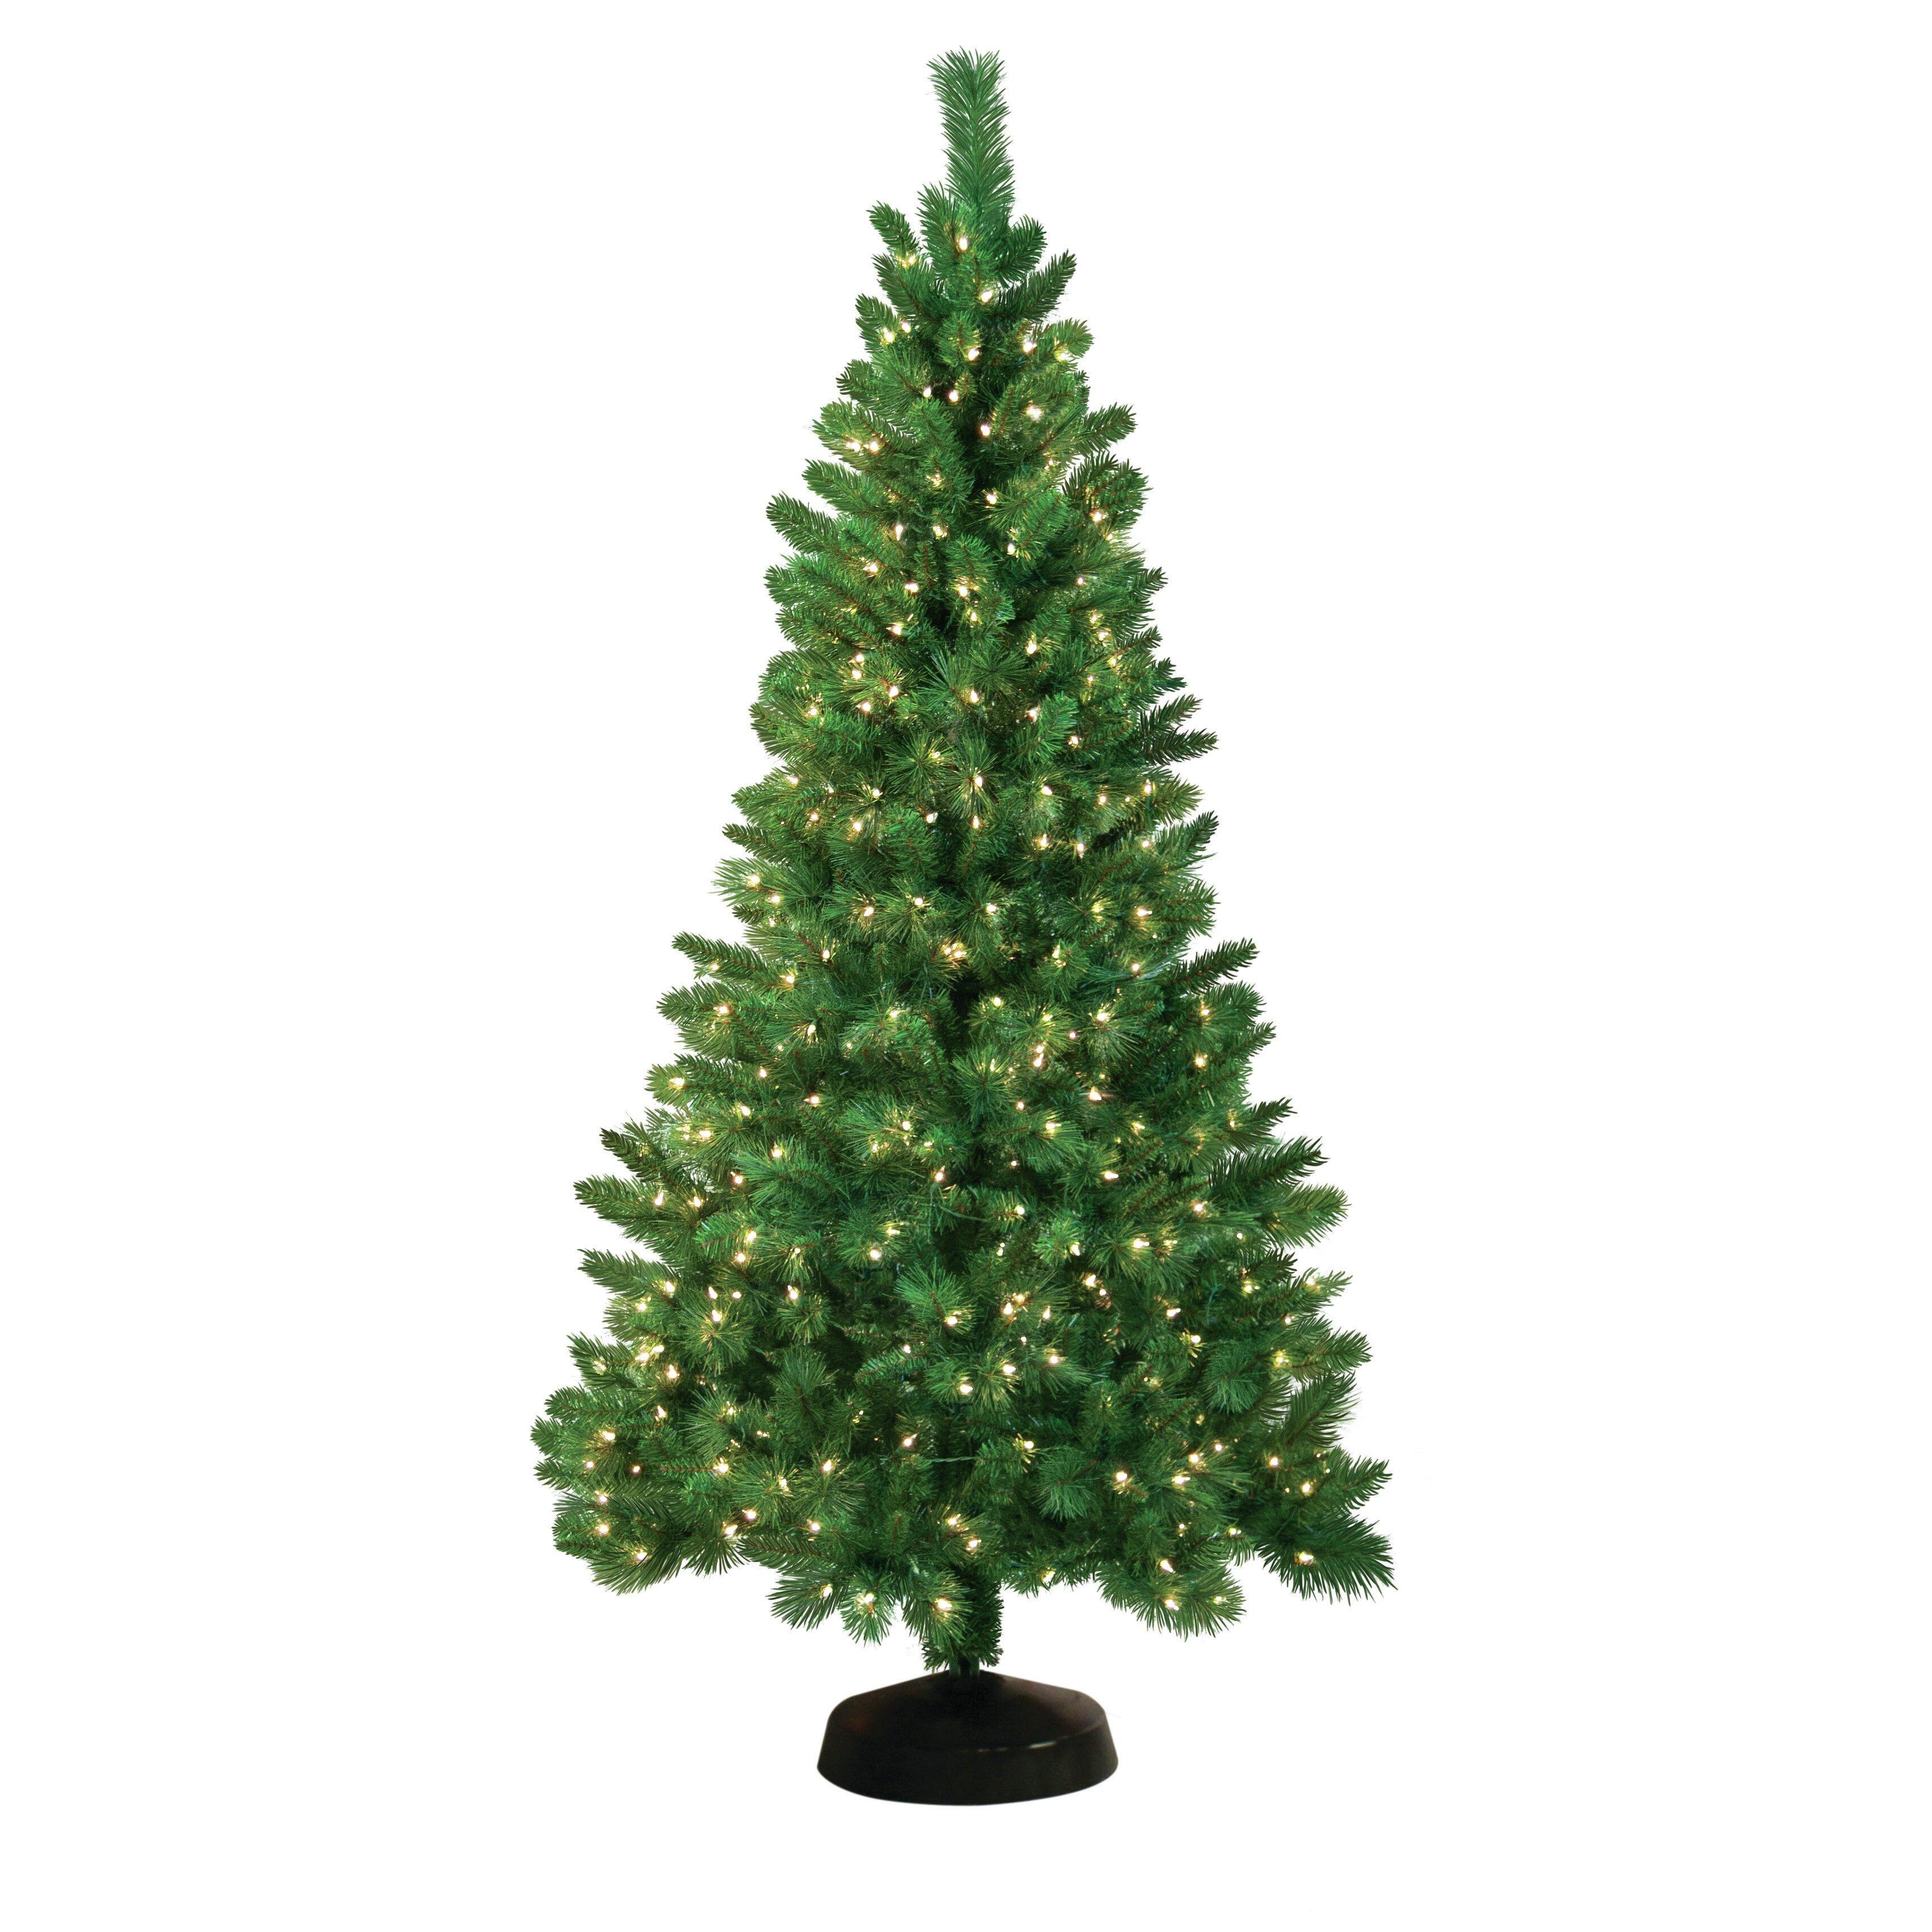 General Foam Plastics Jordan 7 39 Green Artificial Christmas